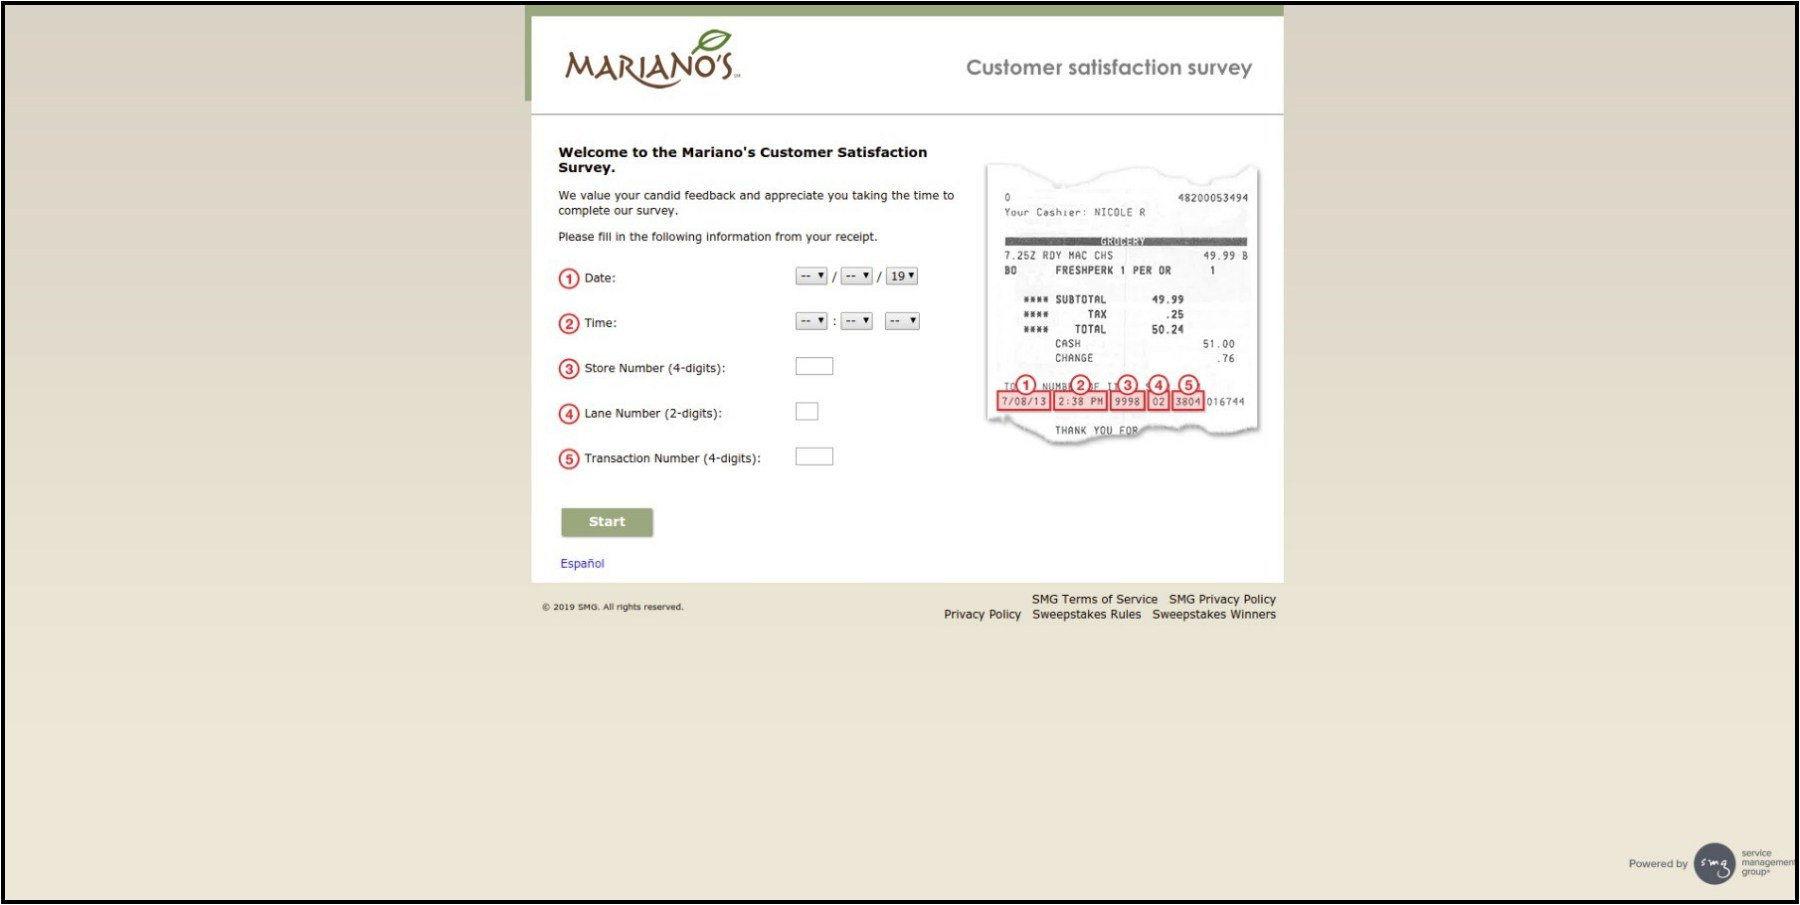 www.MarianosExperience.com